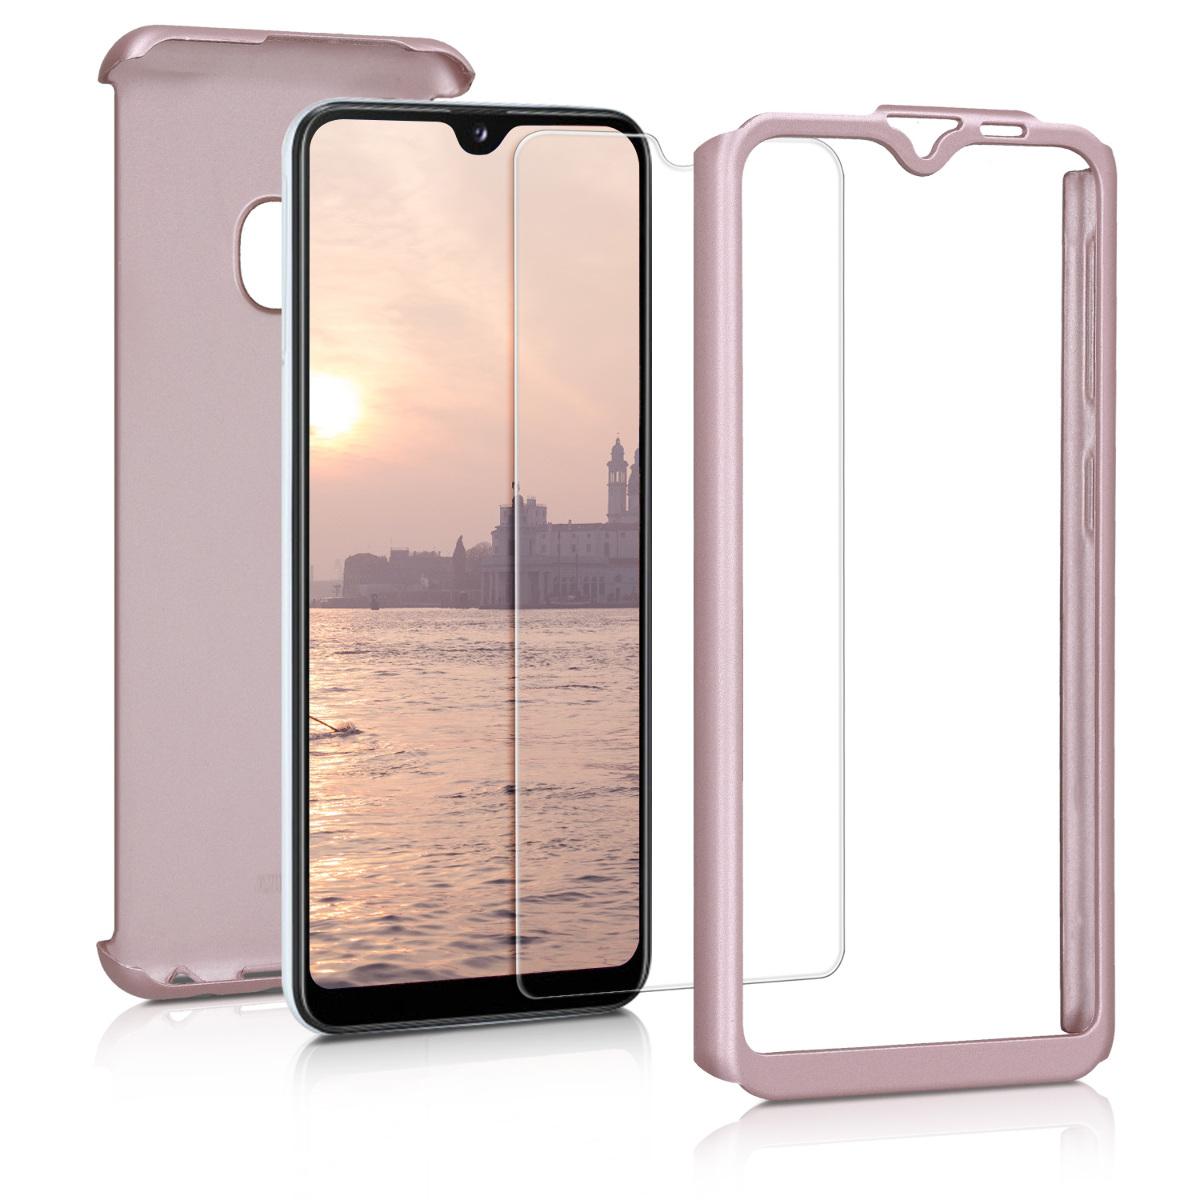 KW Θήκη Full Body Samsung Galaxy A20e - Metallic Rose Gold (48745.31)